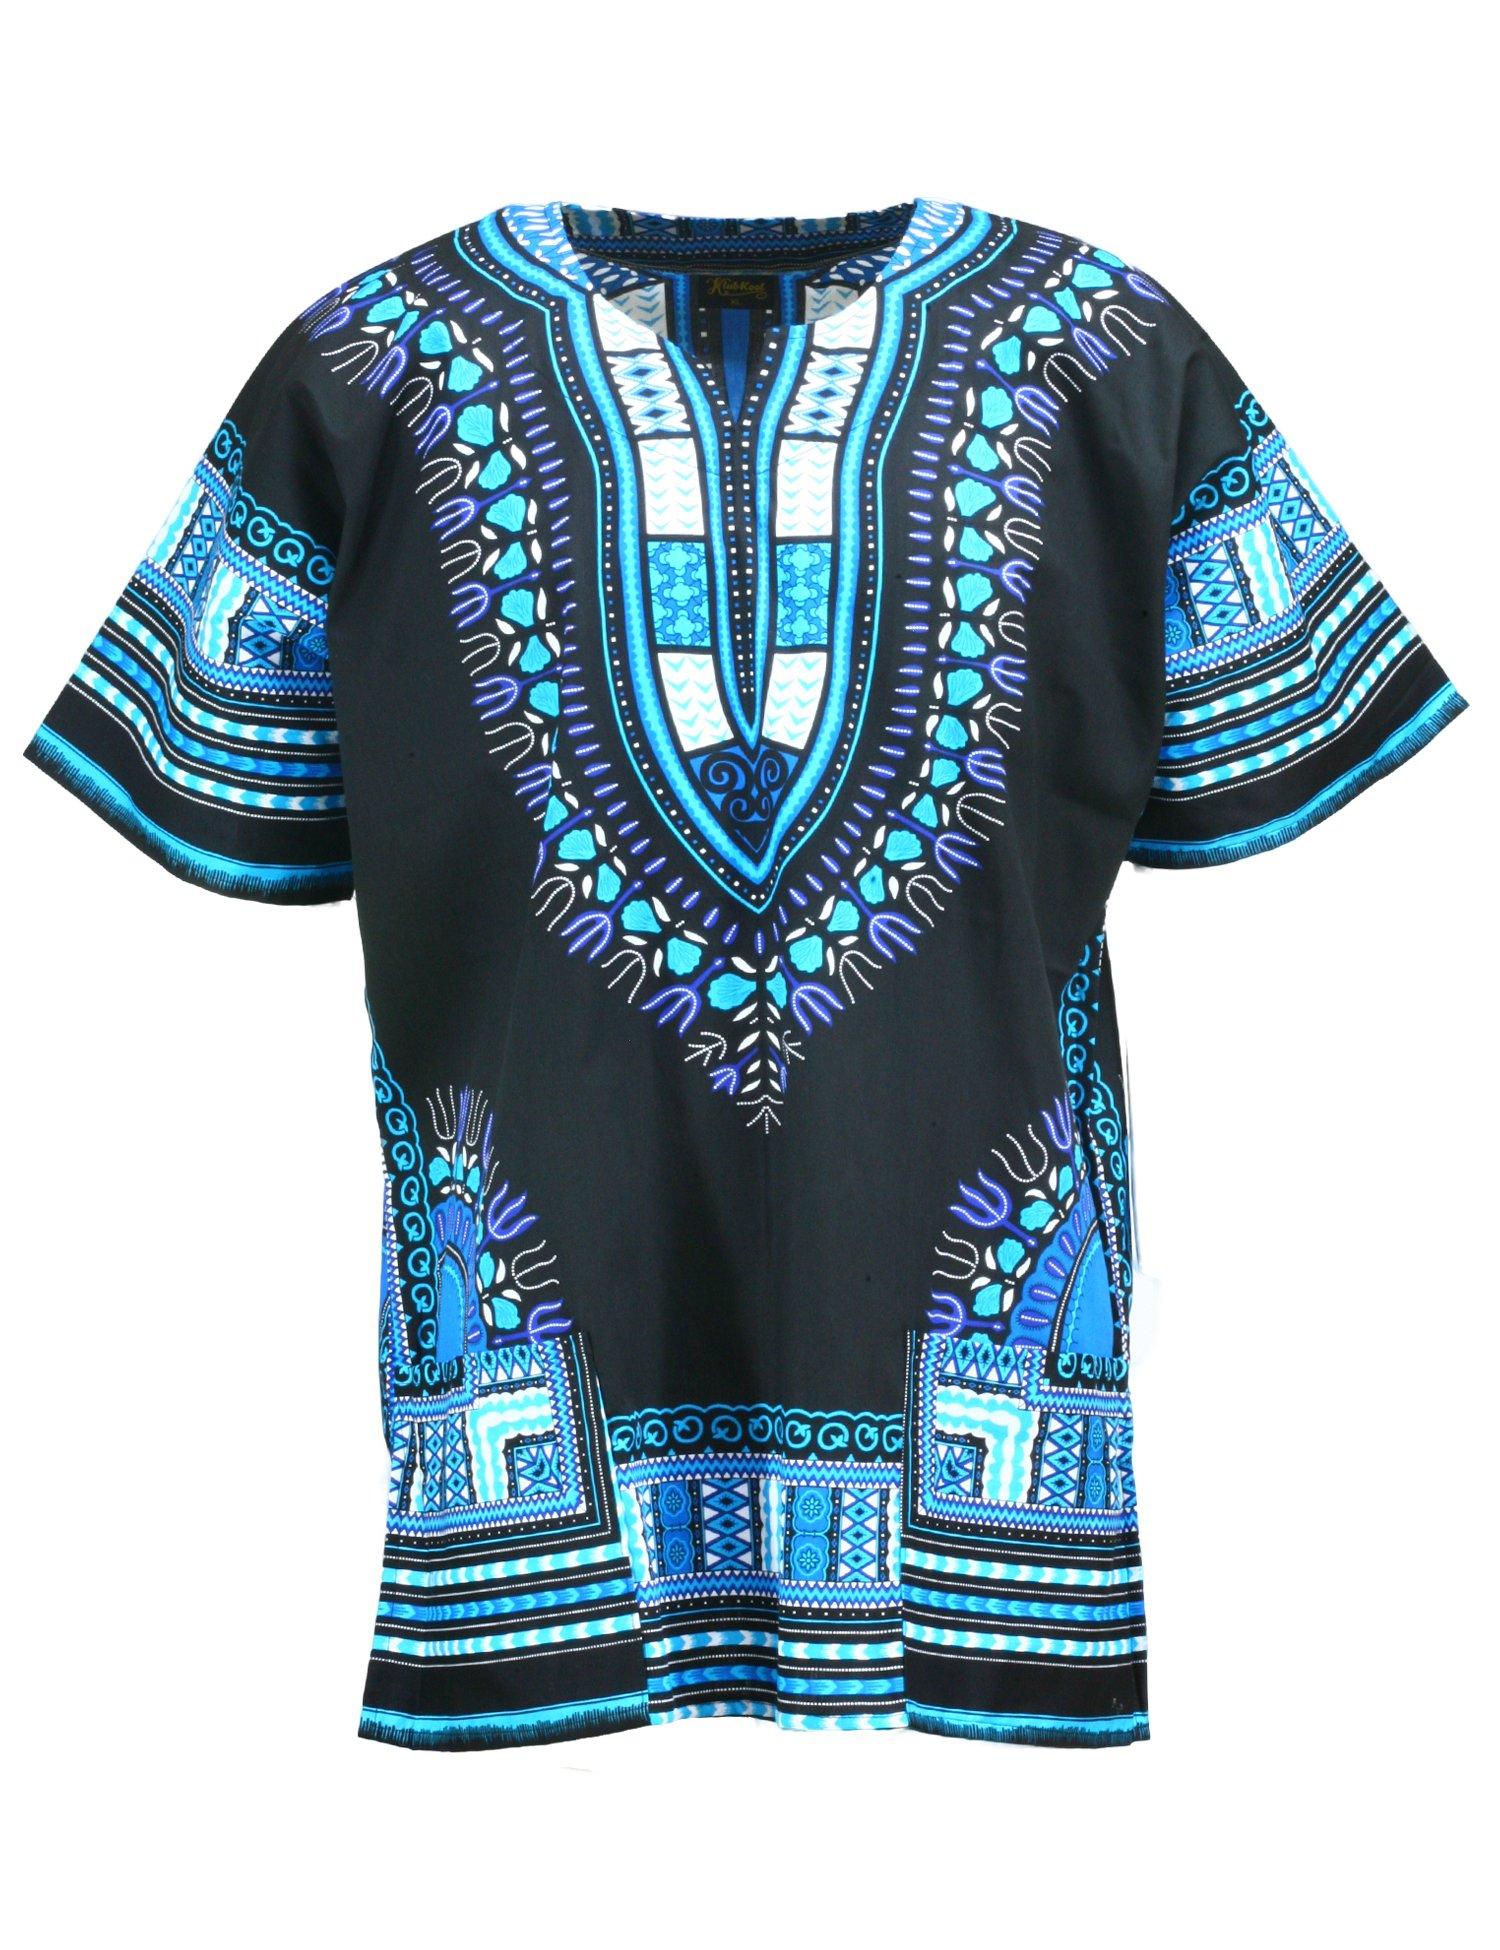 KlubKool Dashiki Shirt Tribal African Caftan Boho Unisex Top Shirt (Black/Light Blue,3X-Large)